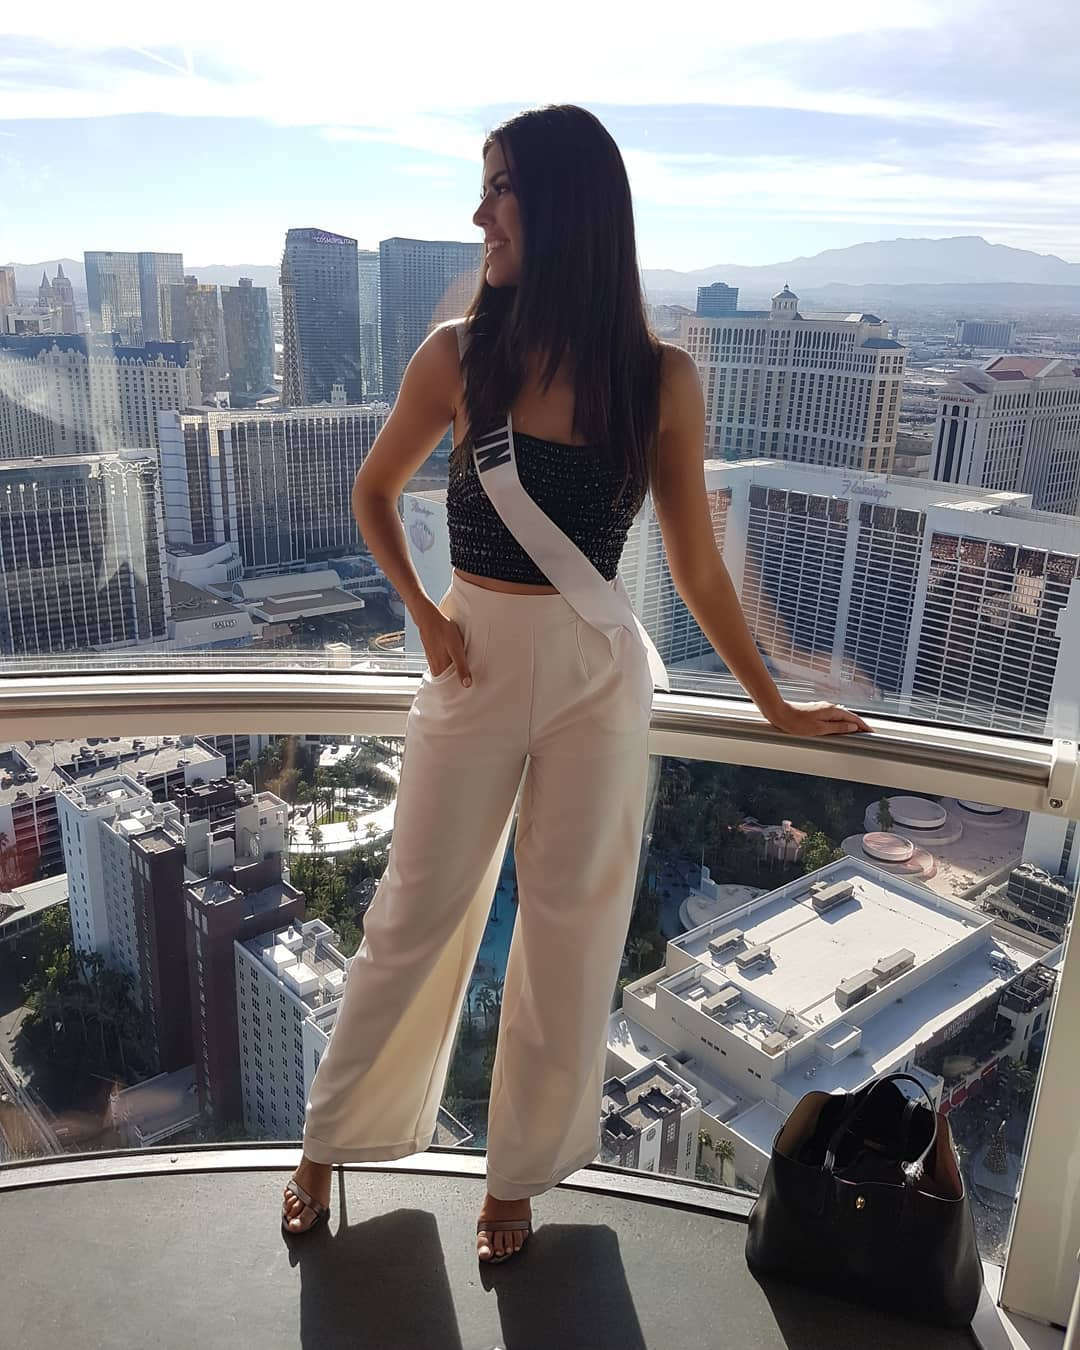 sofia del prado, top 10 de miss universe 2017/reyna hispanoamericana 2015/miss charm spain 2021. - Página 12 24127010